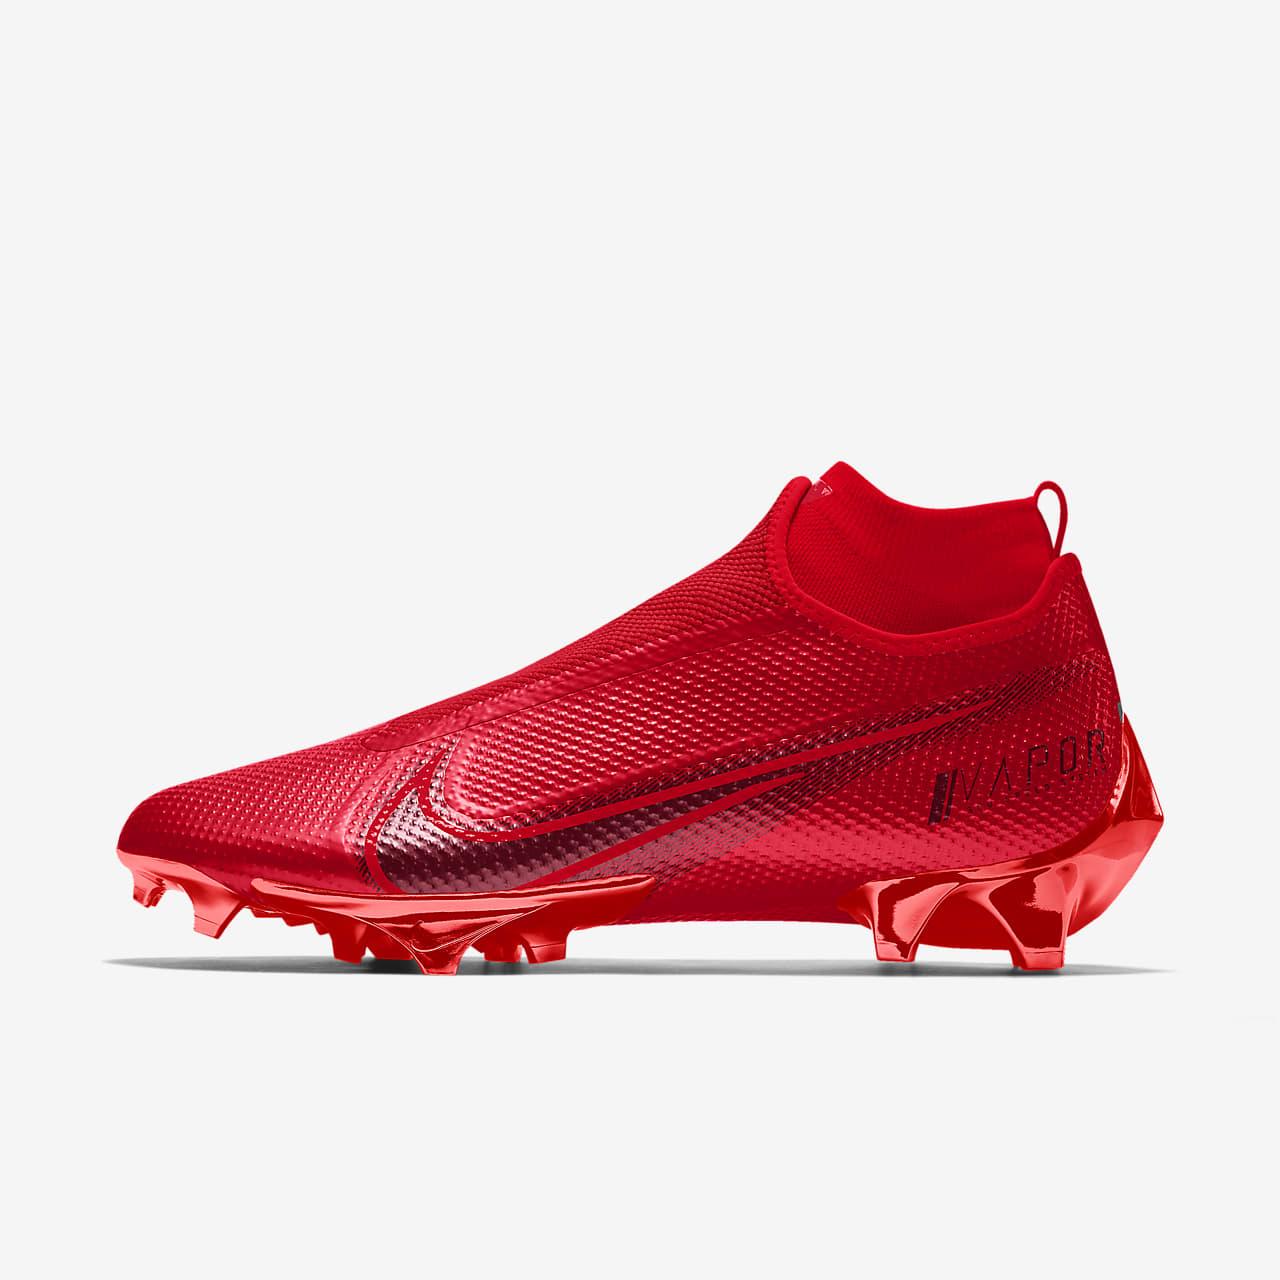 Nike Vapor Edge Pro 360 By You personalisierbarer Fußballschuh